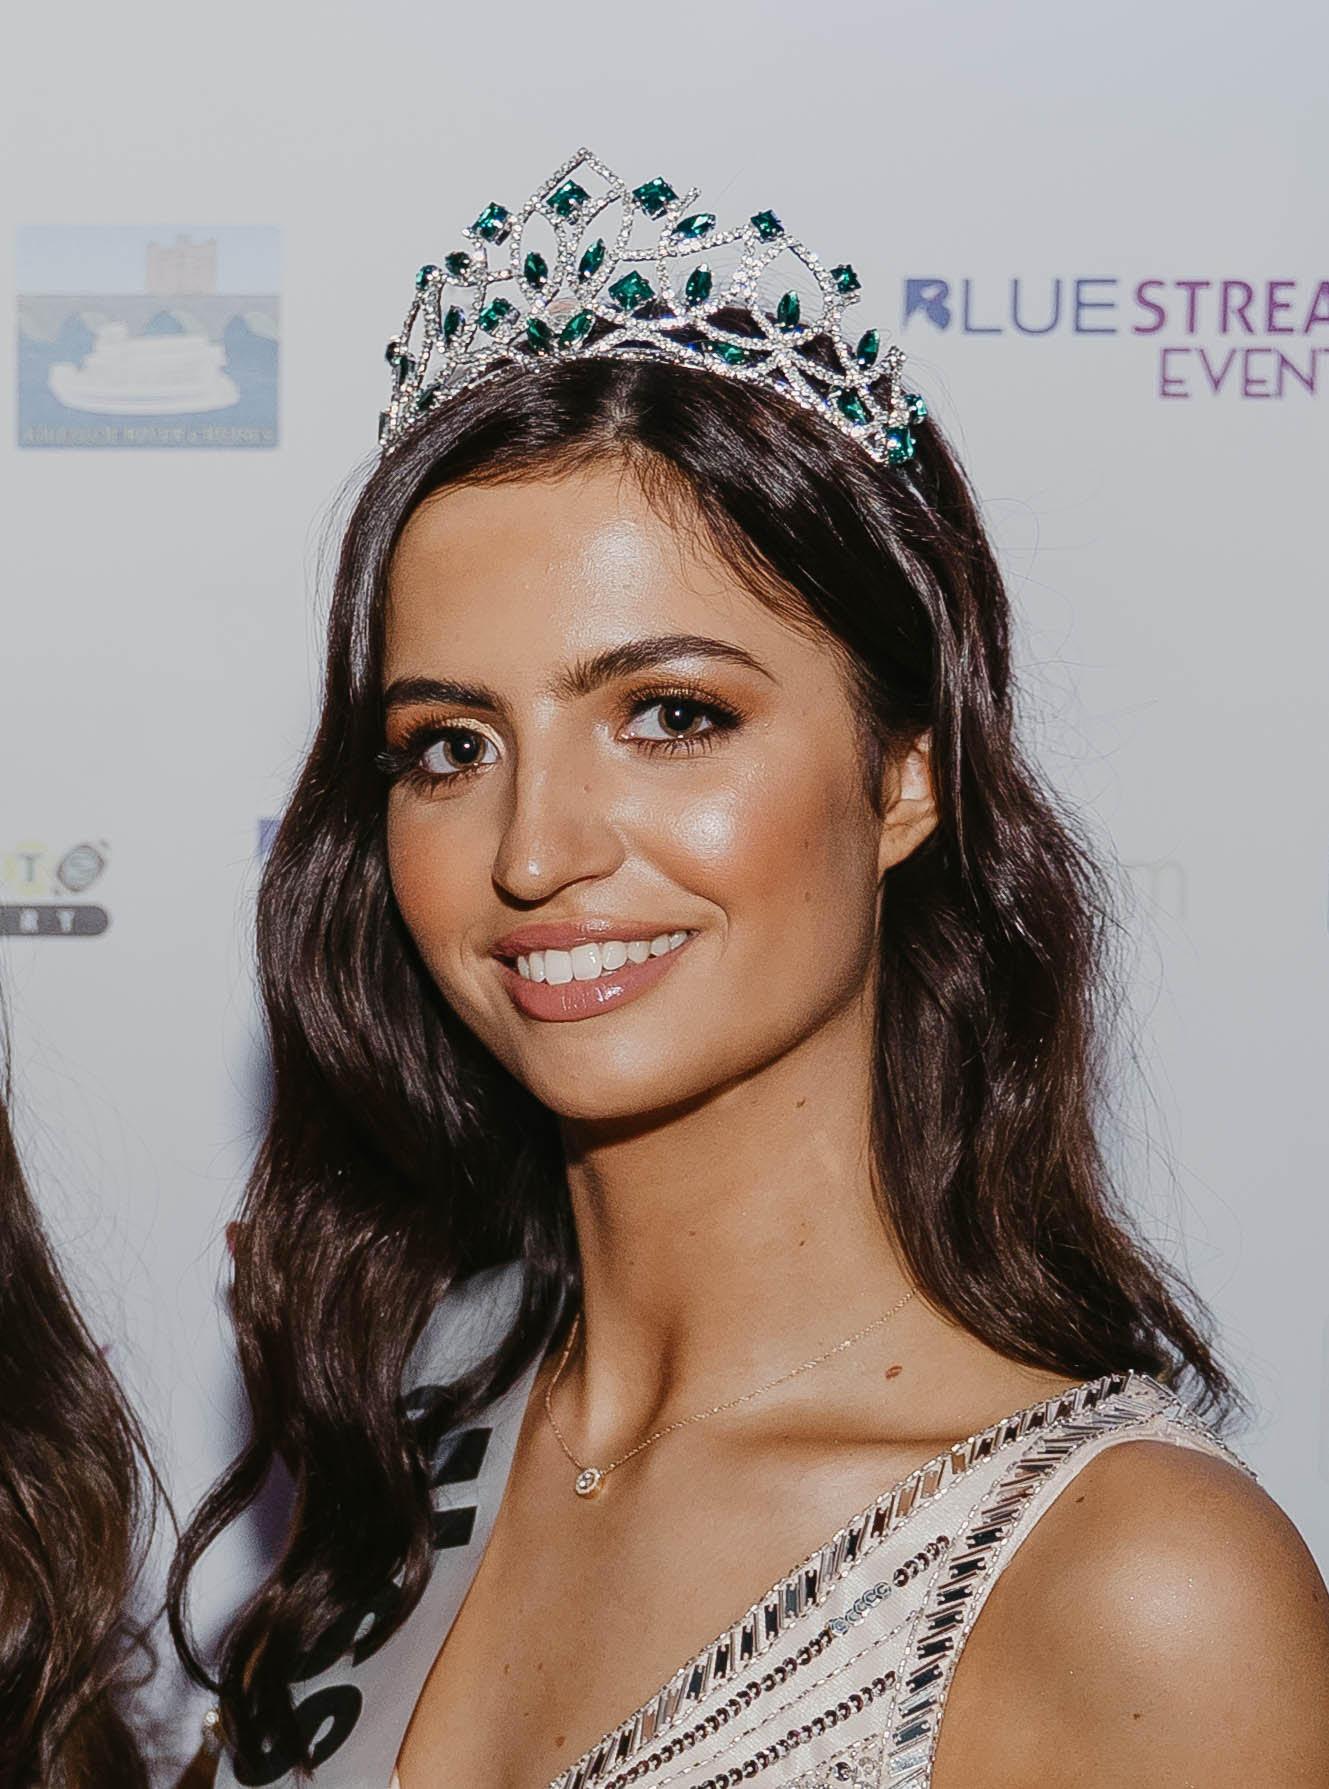 Miss 101 Limerick Christina Alcazar Deverell